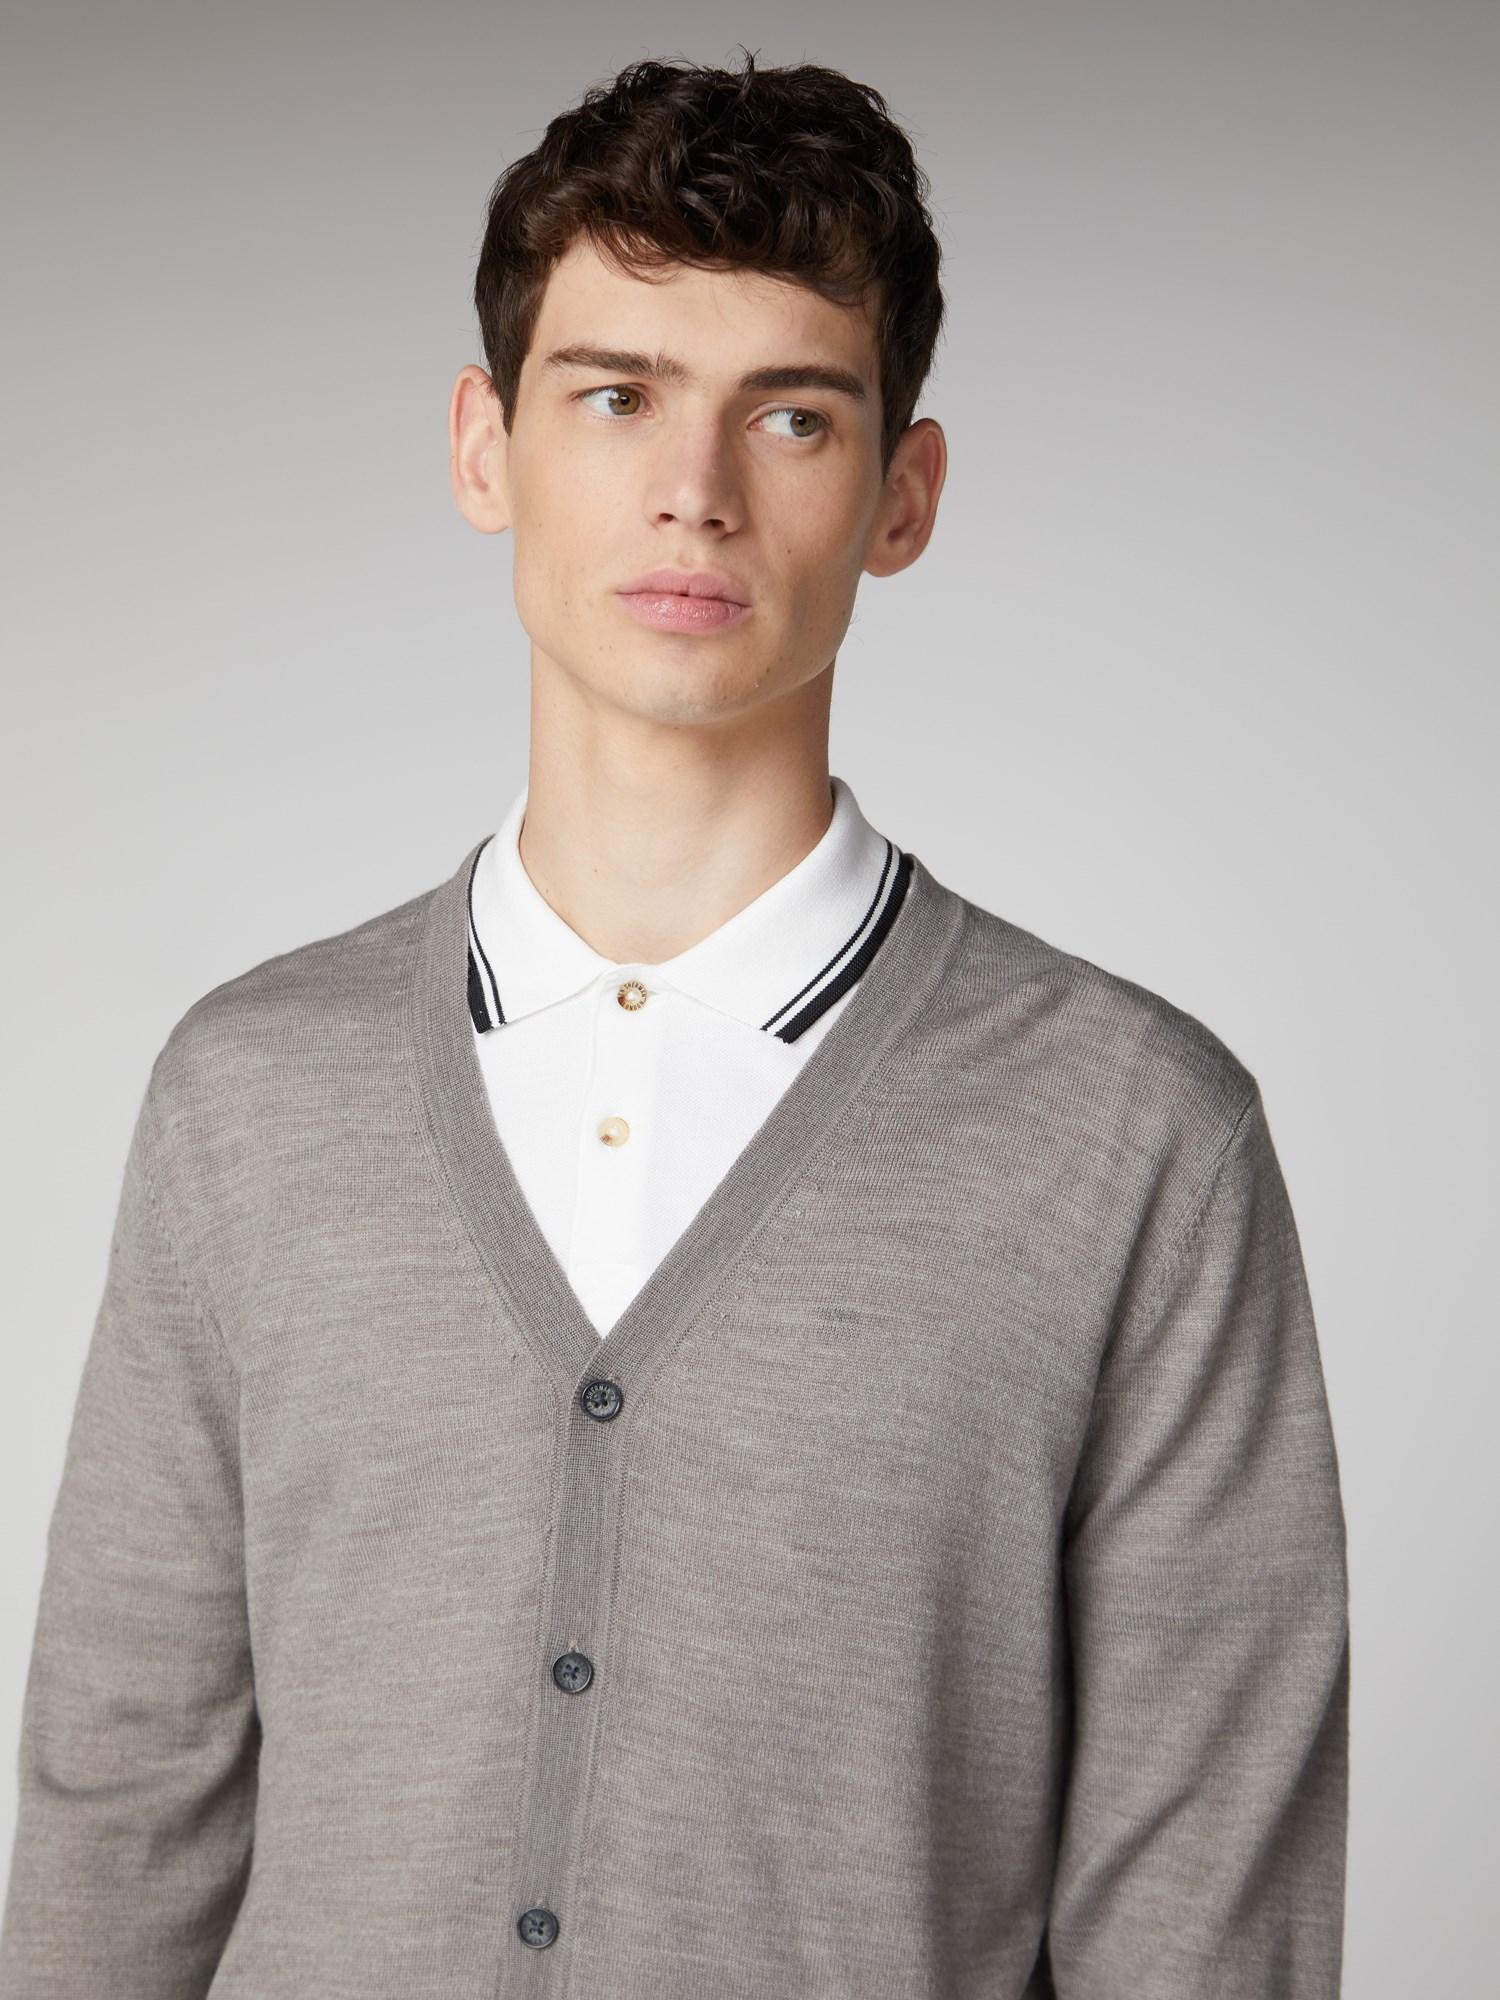 Men's Grey Merino Button Cardigan   Ben Sherman   Est 1963